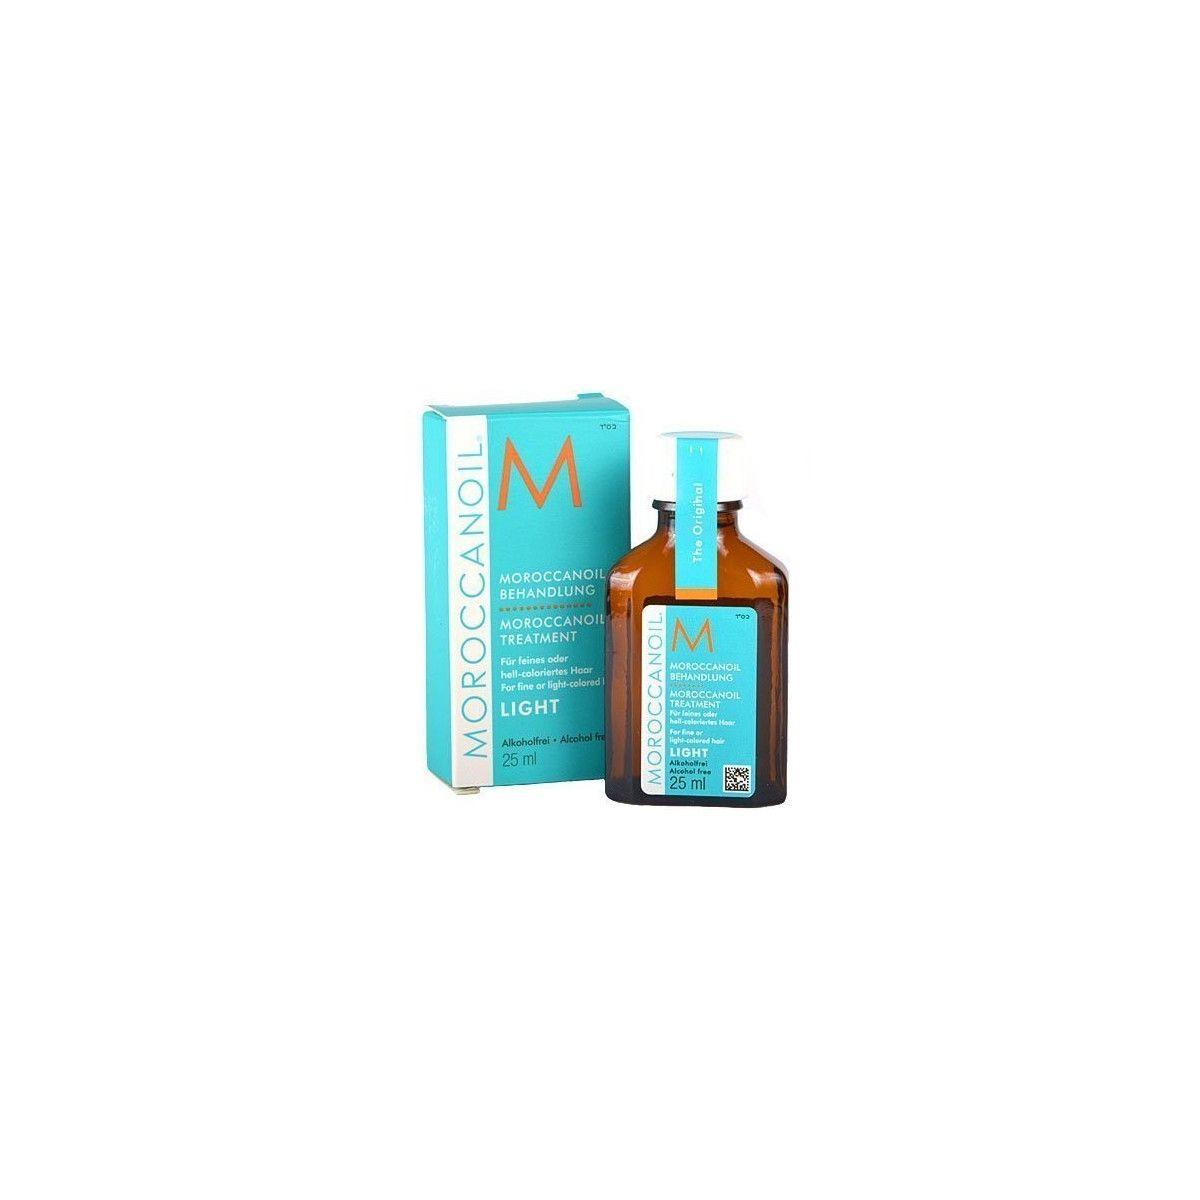 MoroccanOil Treatment LIGHT, lekki olejek arganowy do włosów 25ml